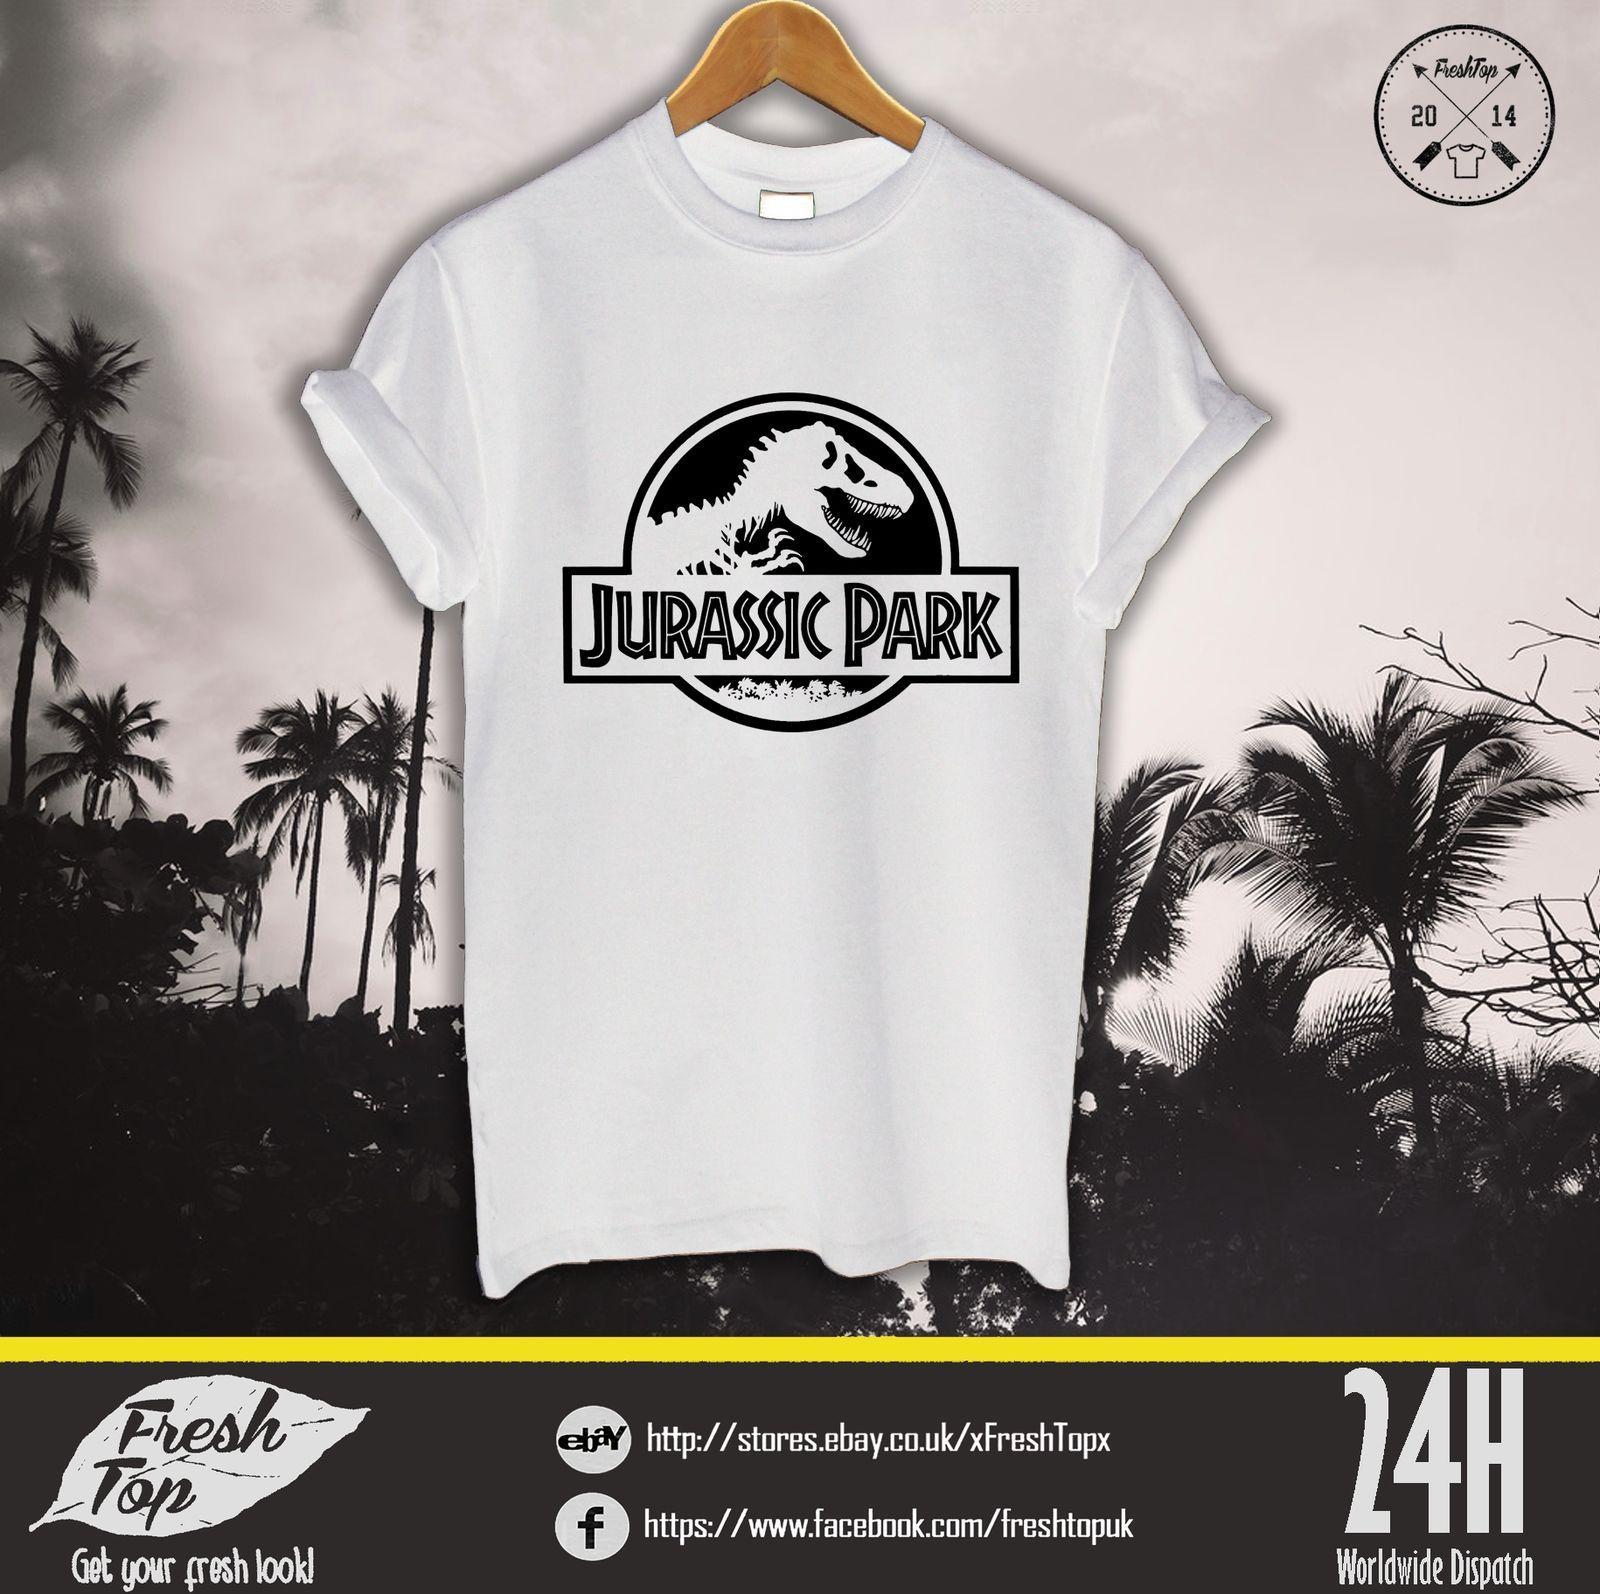 03c7280fd74 Jurassic Park World T Shirt Retro Vintage Dinosaur Movie 90s Fallen Kingdom  Funny Unisex Casual Tee Gift Buy T Shirts Online Funny Tee Shirts From ...